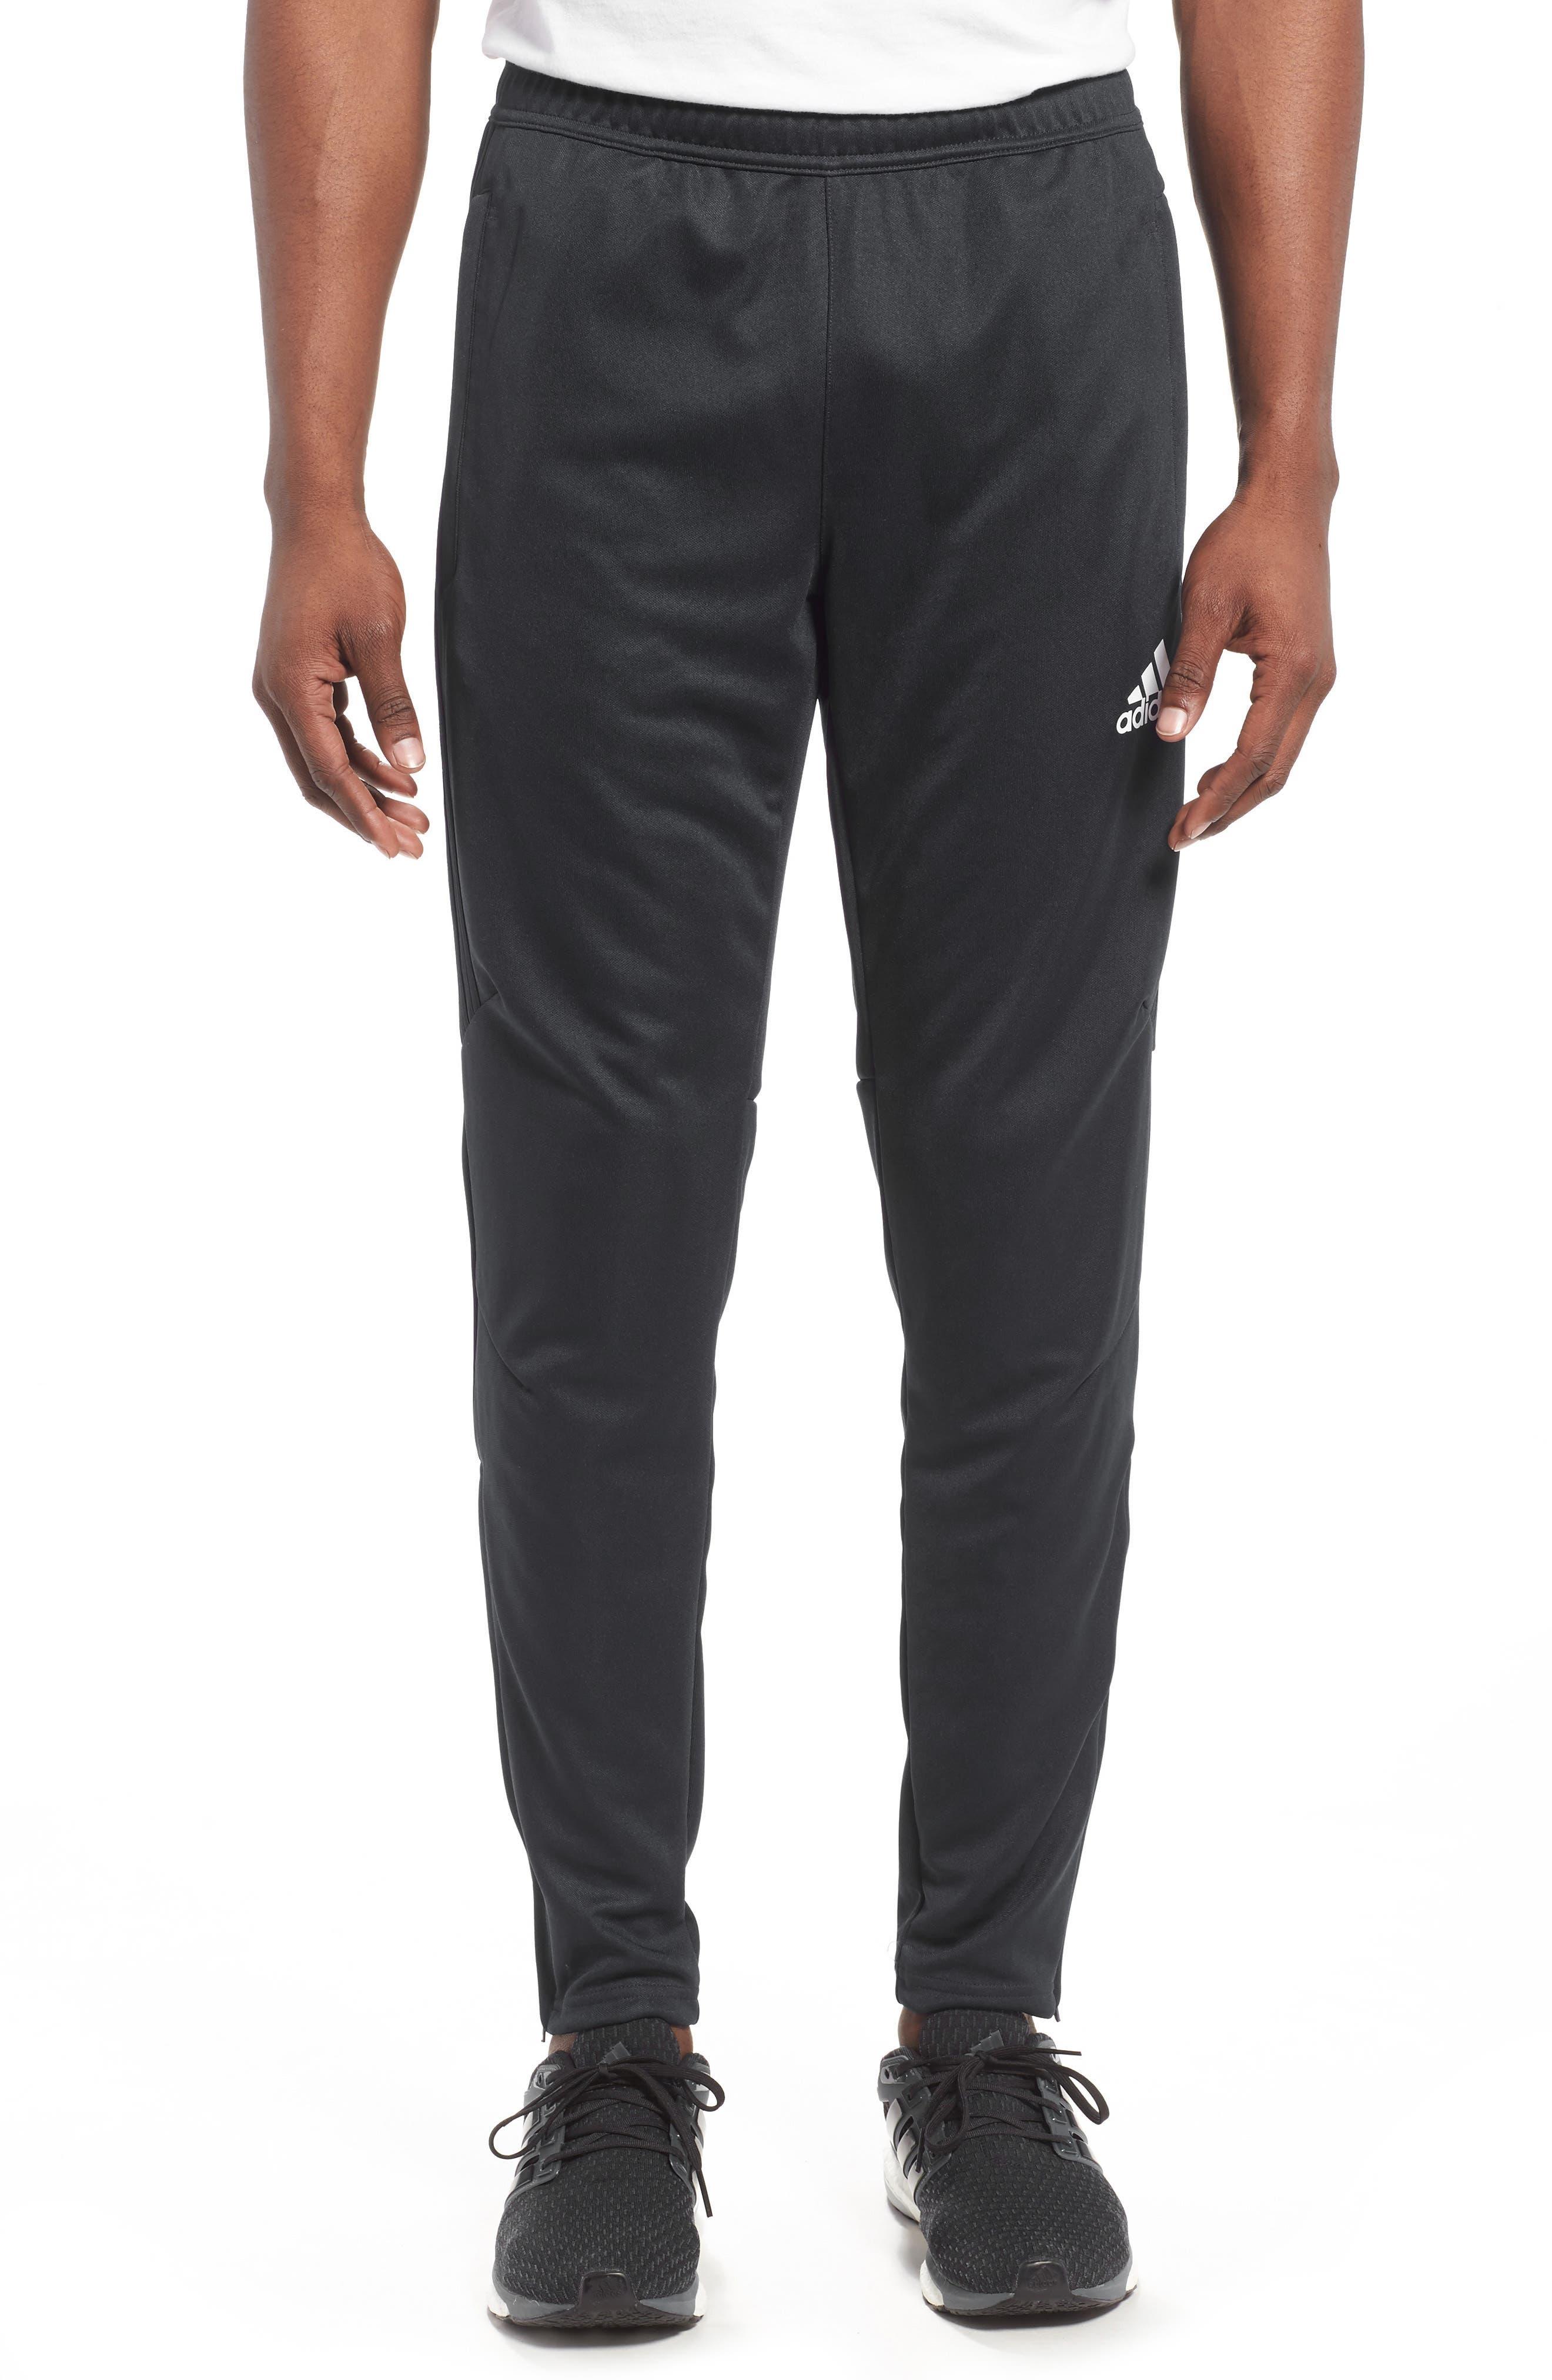 ADIDAS, Tiro 17 Training Pants, Main thumbnail 1, color, BLACK/ WHITE/ WHITE